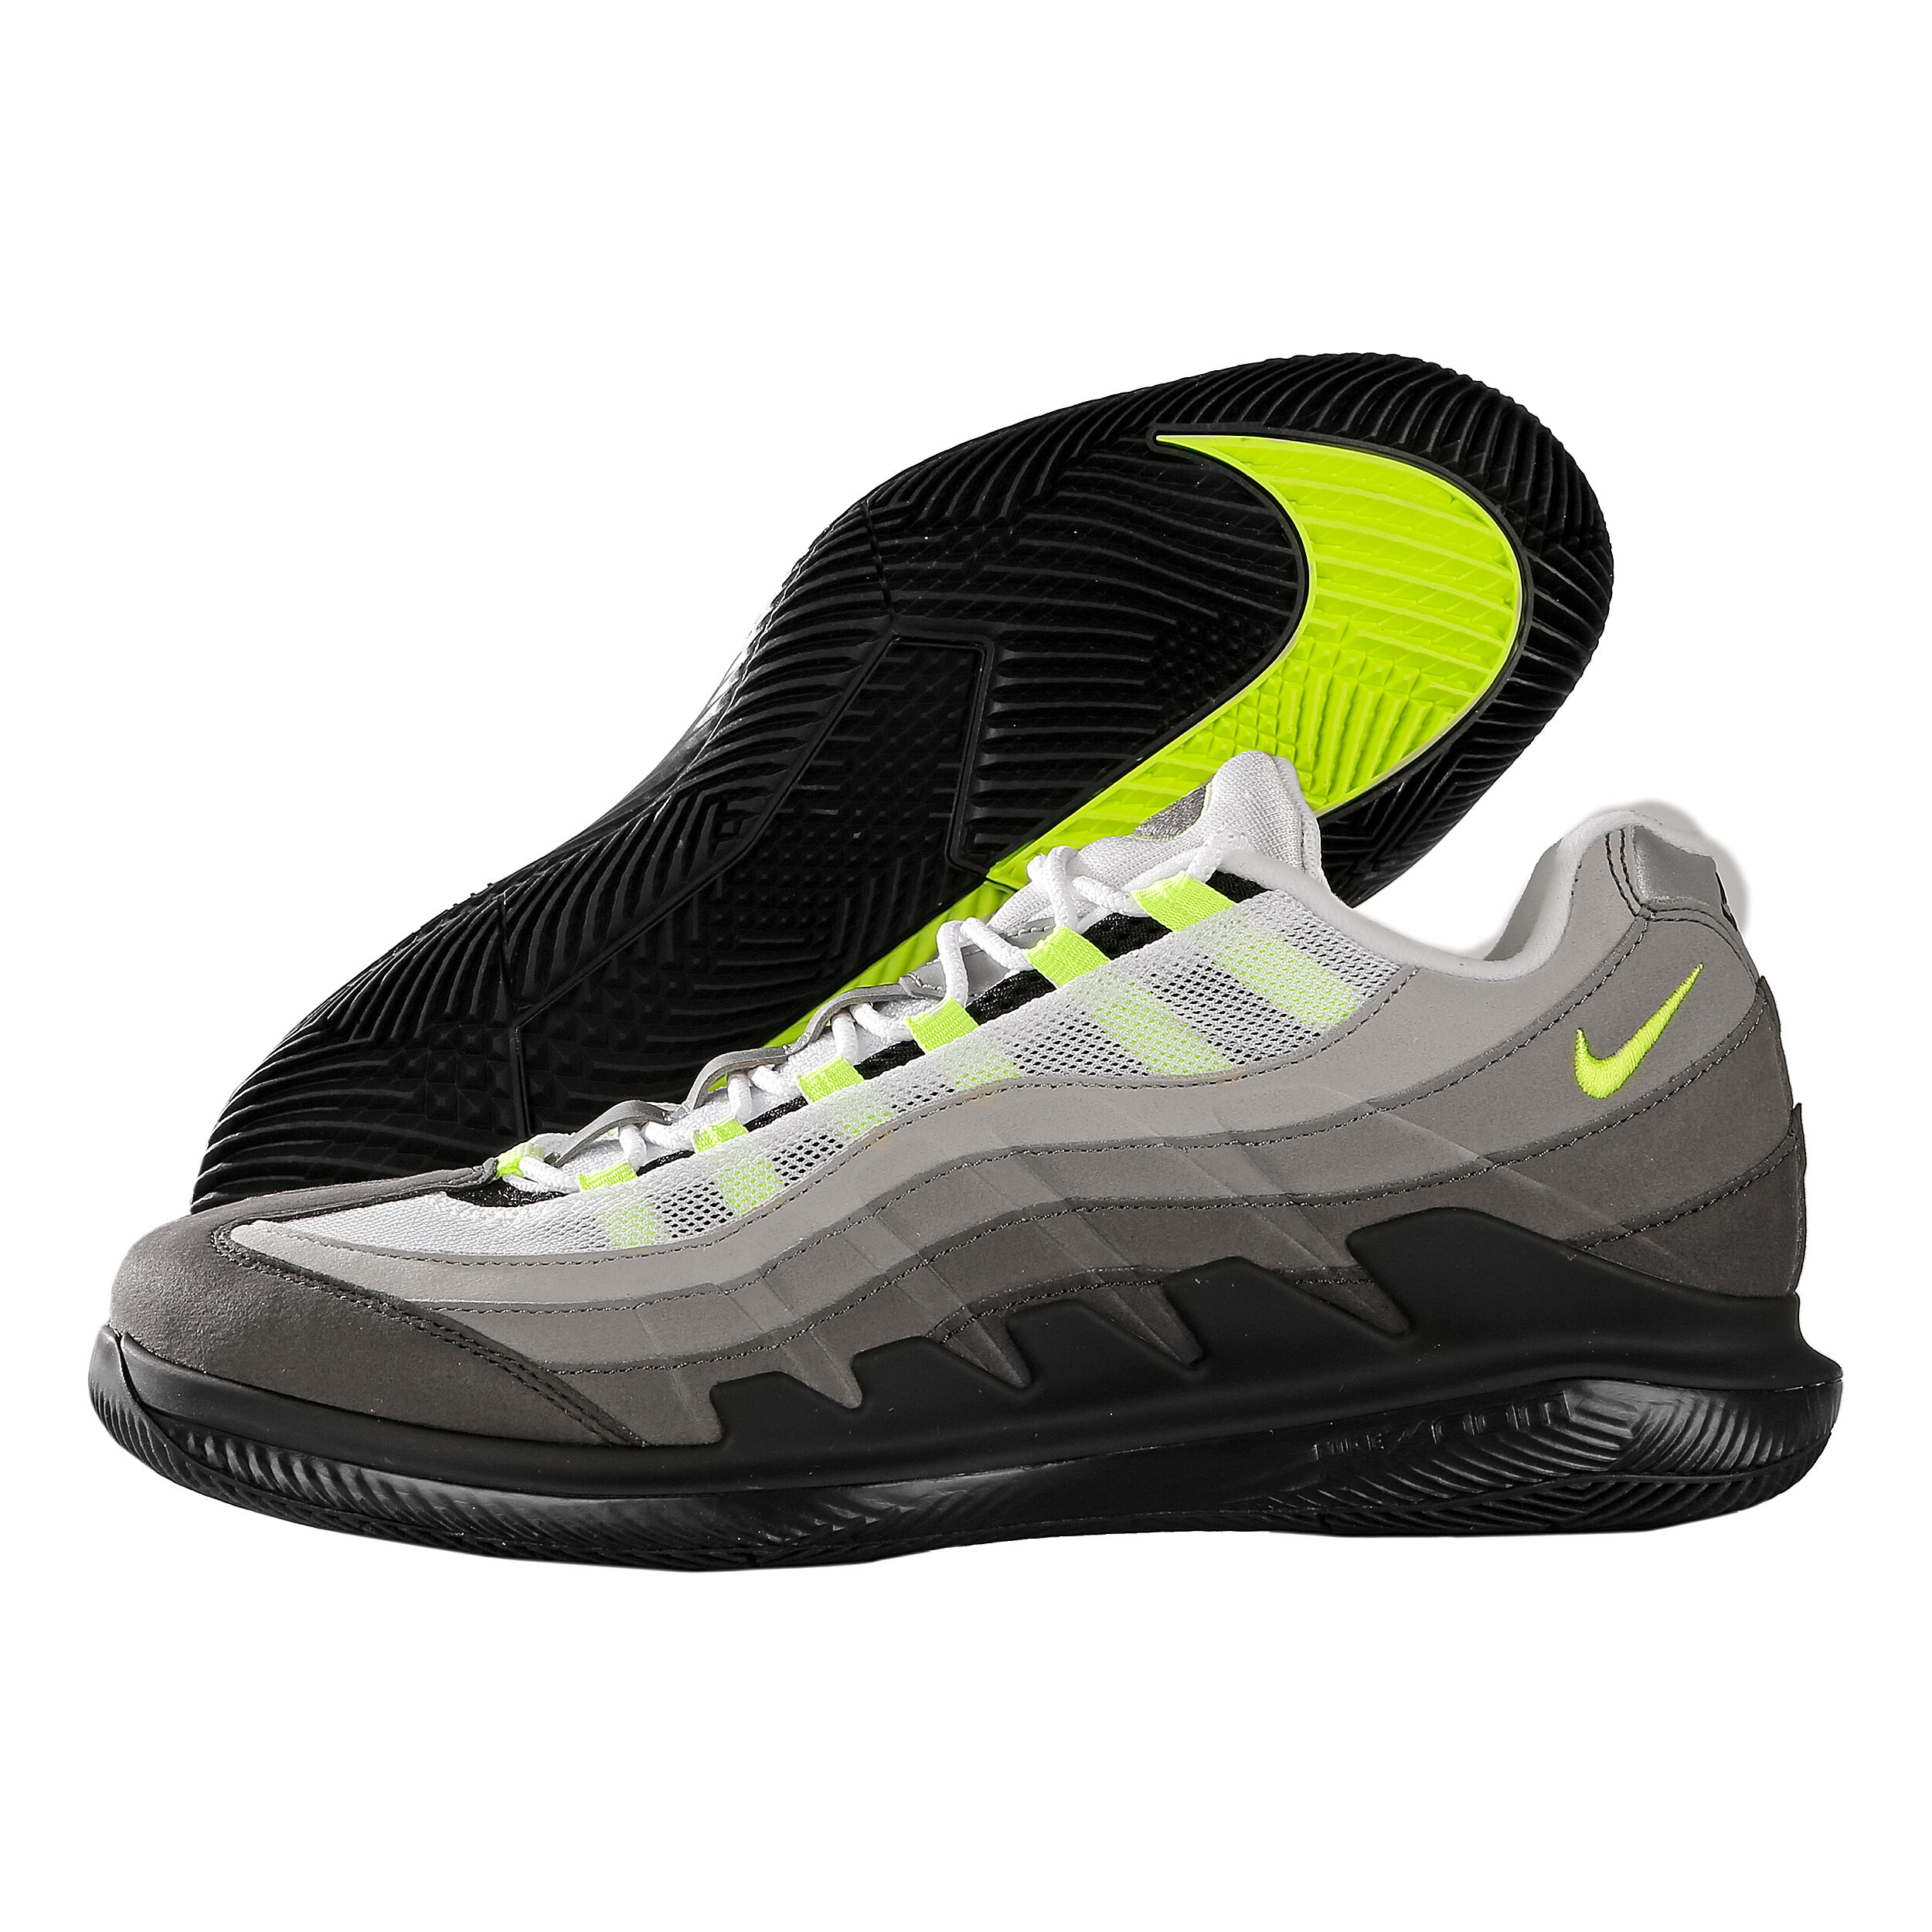 Nike Allcourtschuh 95 Neon Vapor Max X Roger Federer Air n8kXNw0OP